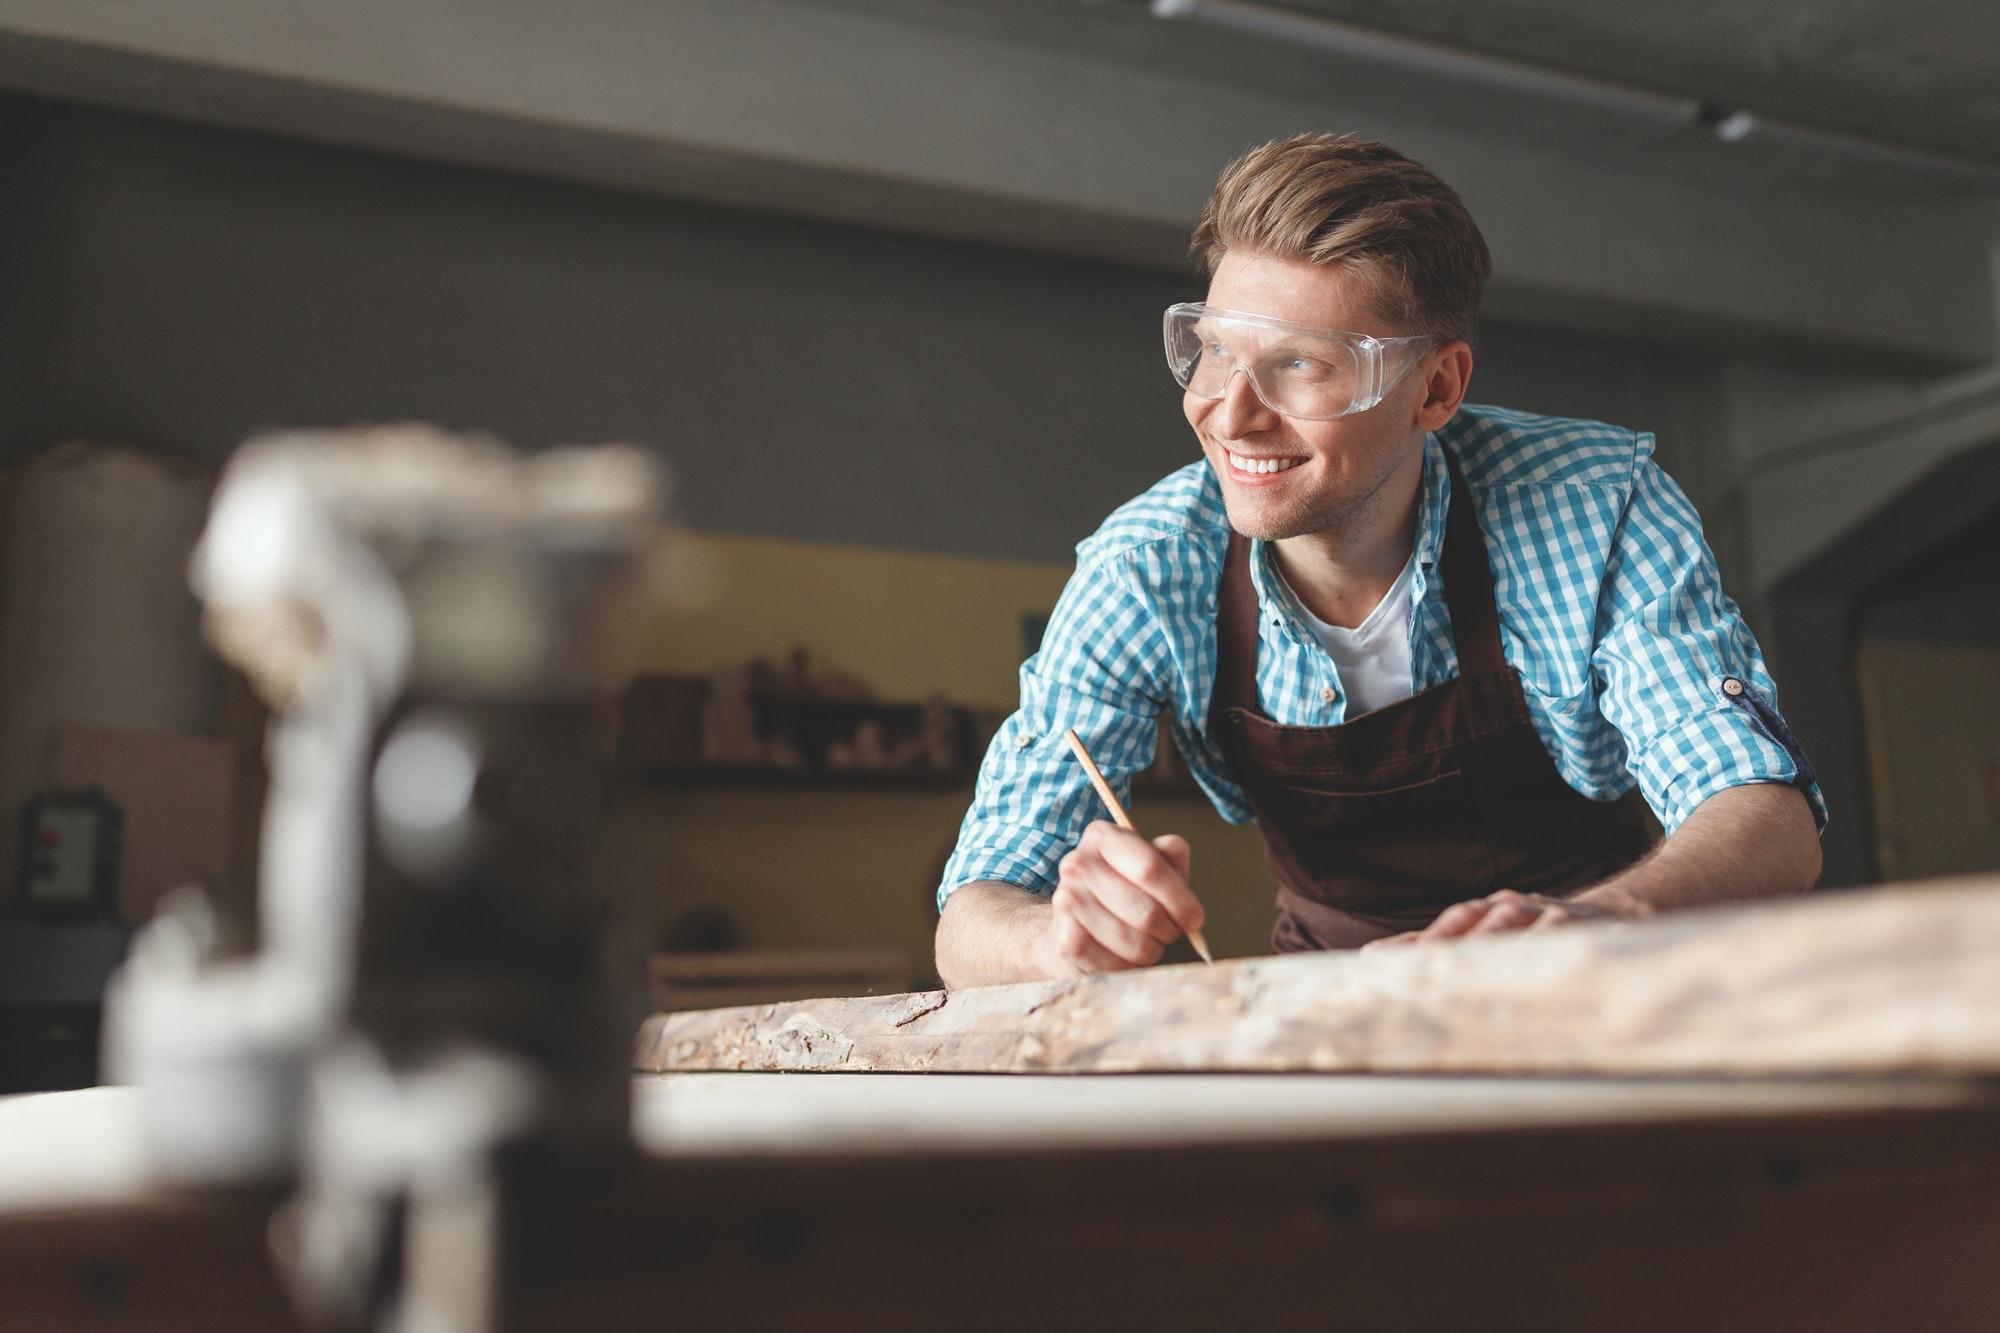 Young smiling carpenter at work